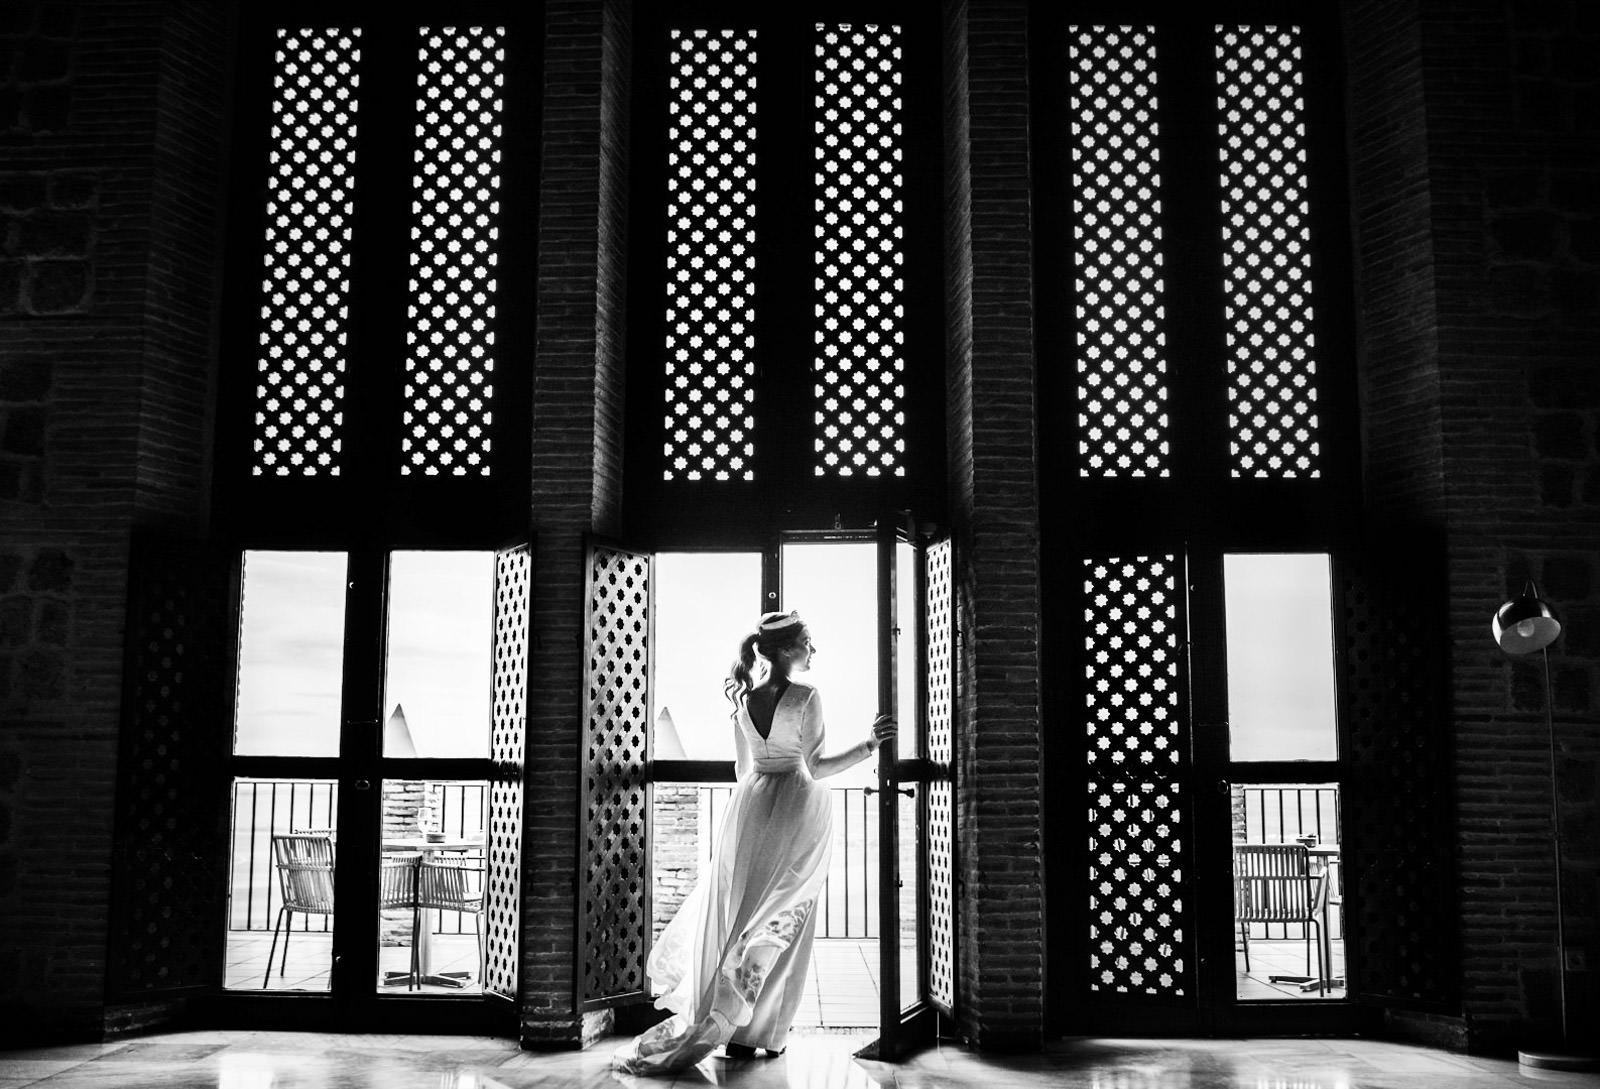 Wedroads-Boda-Sevilla-Parador-Carmona-bridal-engagement-Rafael-Torres-fotografo-bodas-sevilla-madrid-barcelona-wedding-photographer--57.jpg